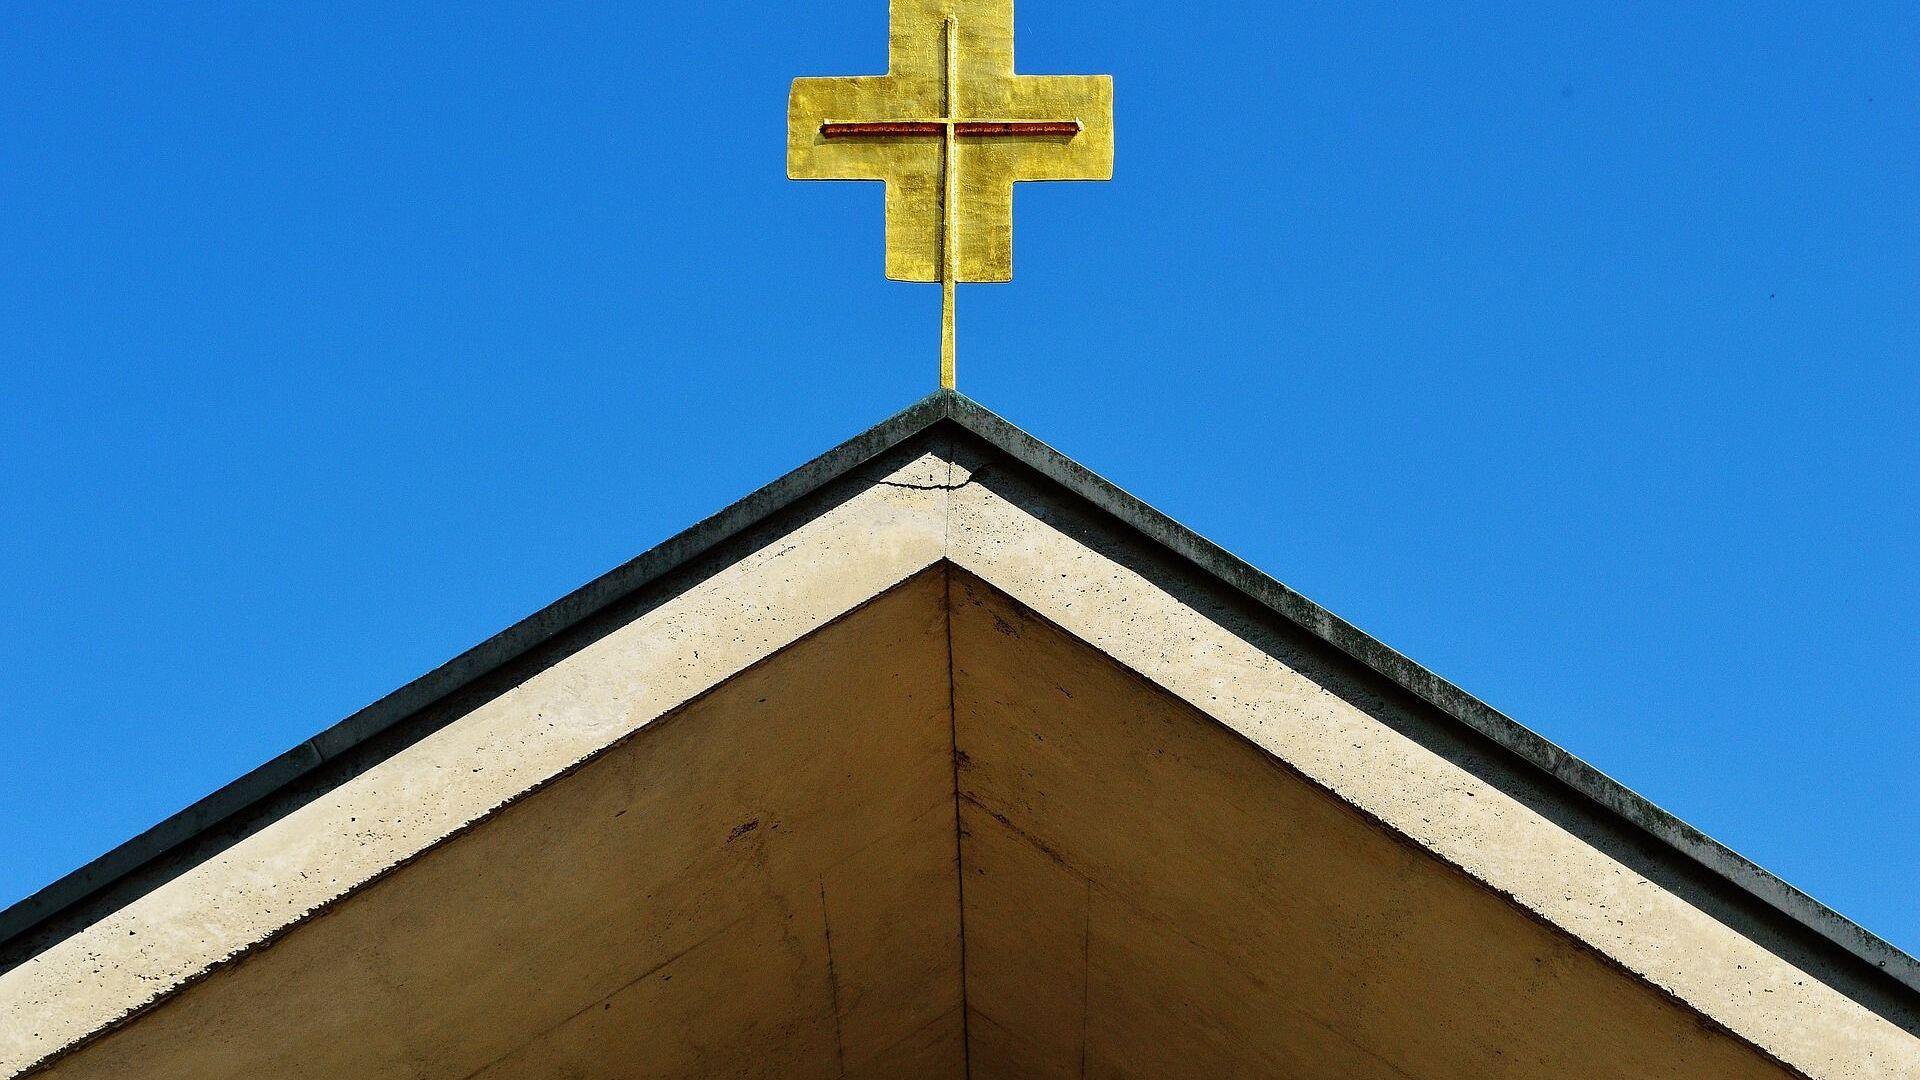 La croce di una chiesa - Sputnik Italia, 1920, 23.06.2021